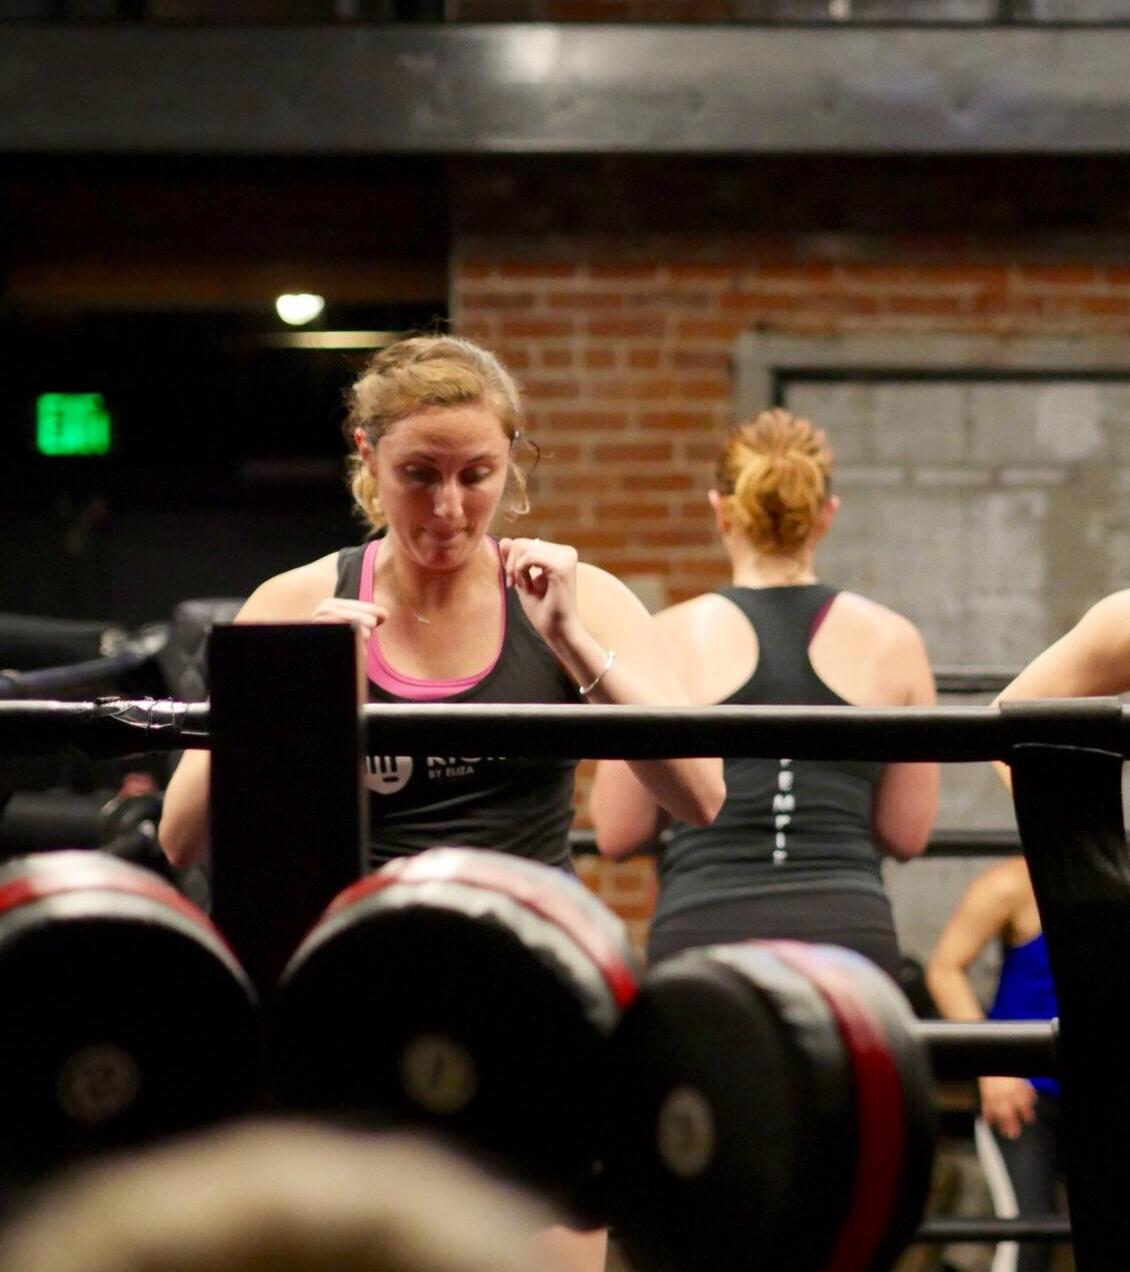 Janessa Barrett - Kick It with Janessa:Healthy Living Downtown,North Attleboro, MAFollow her:@janessabarrett